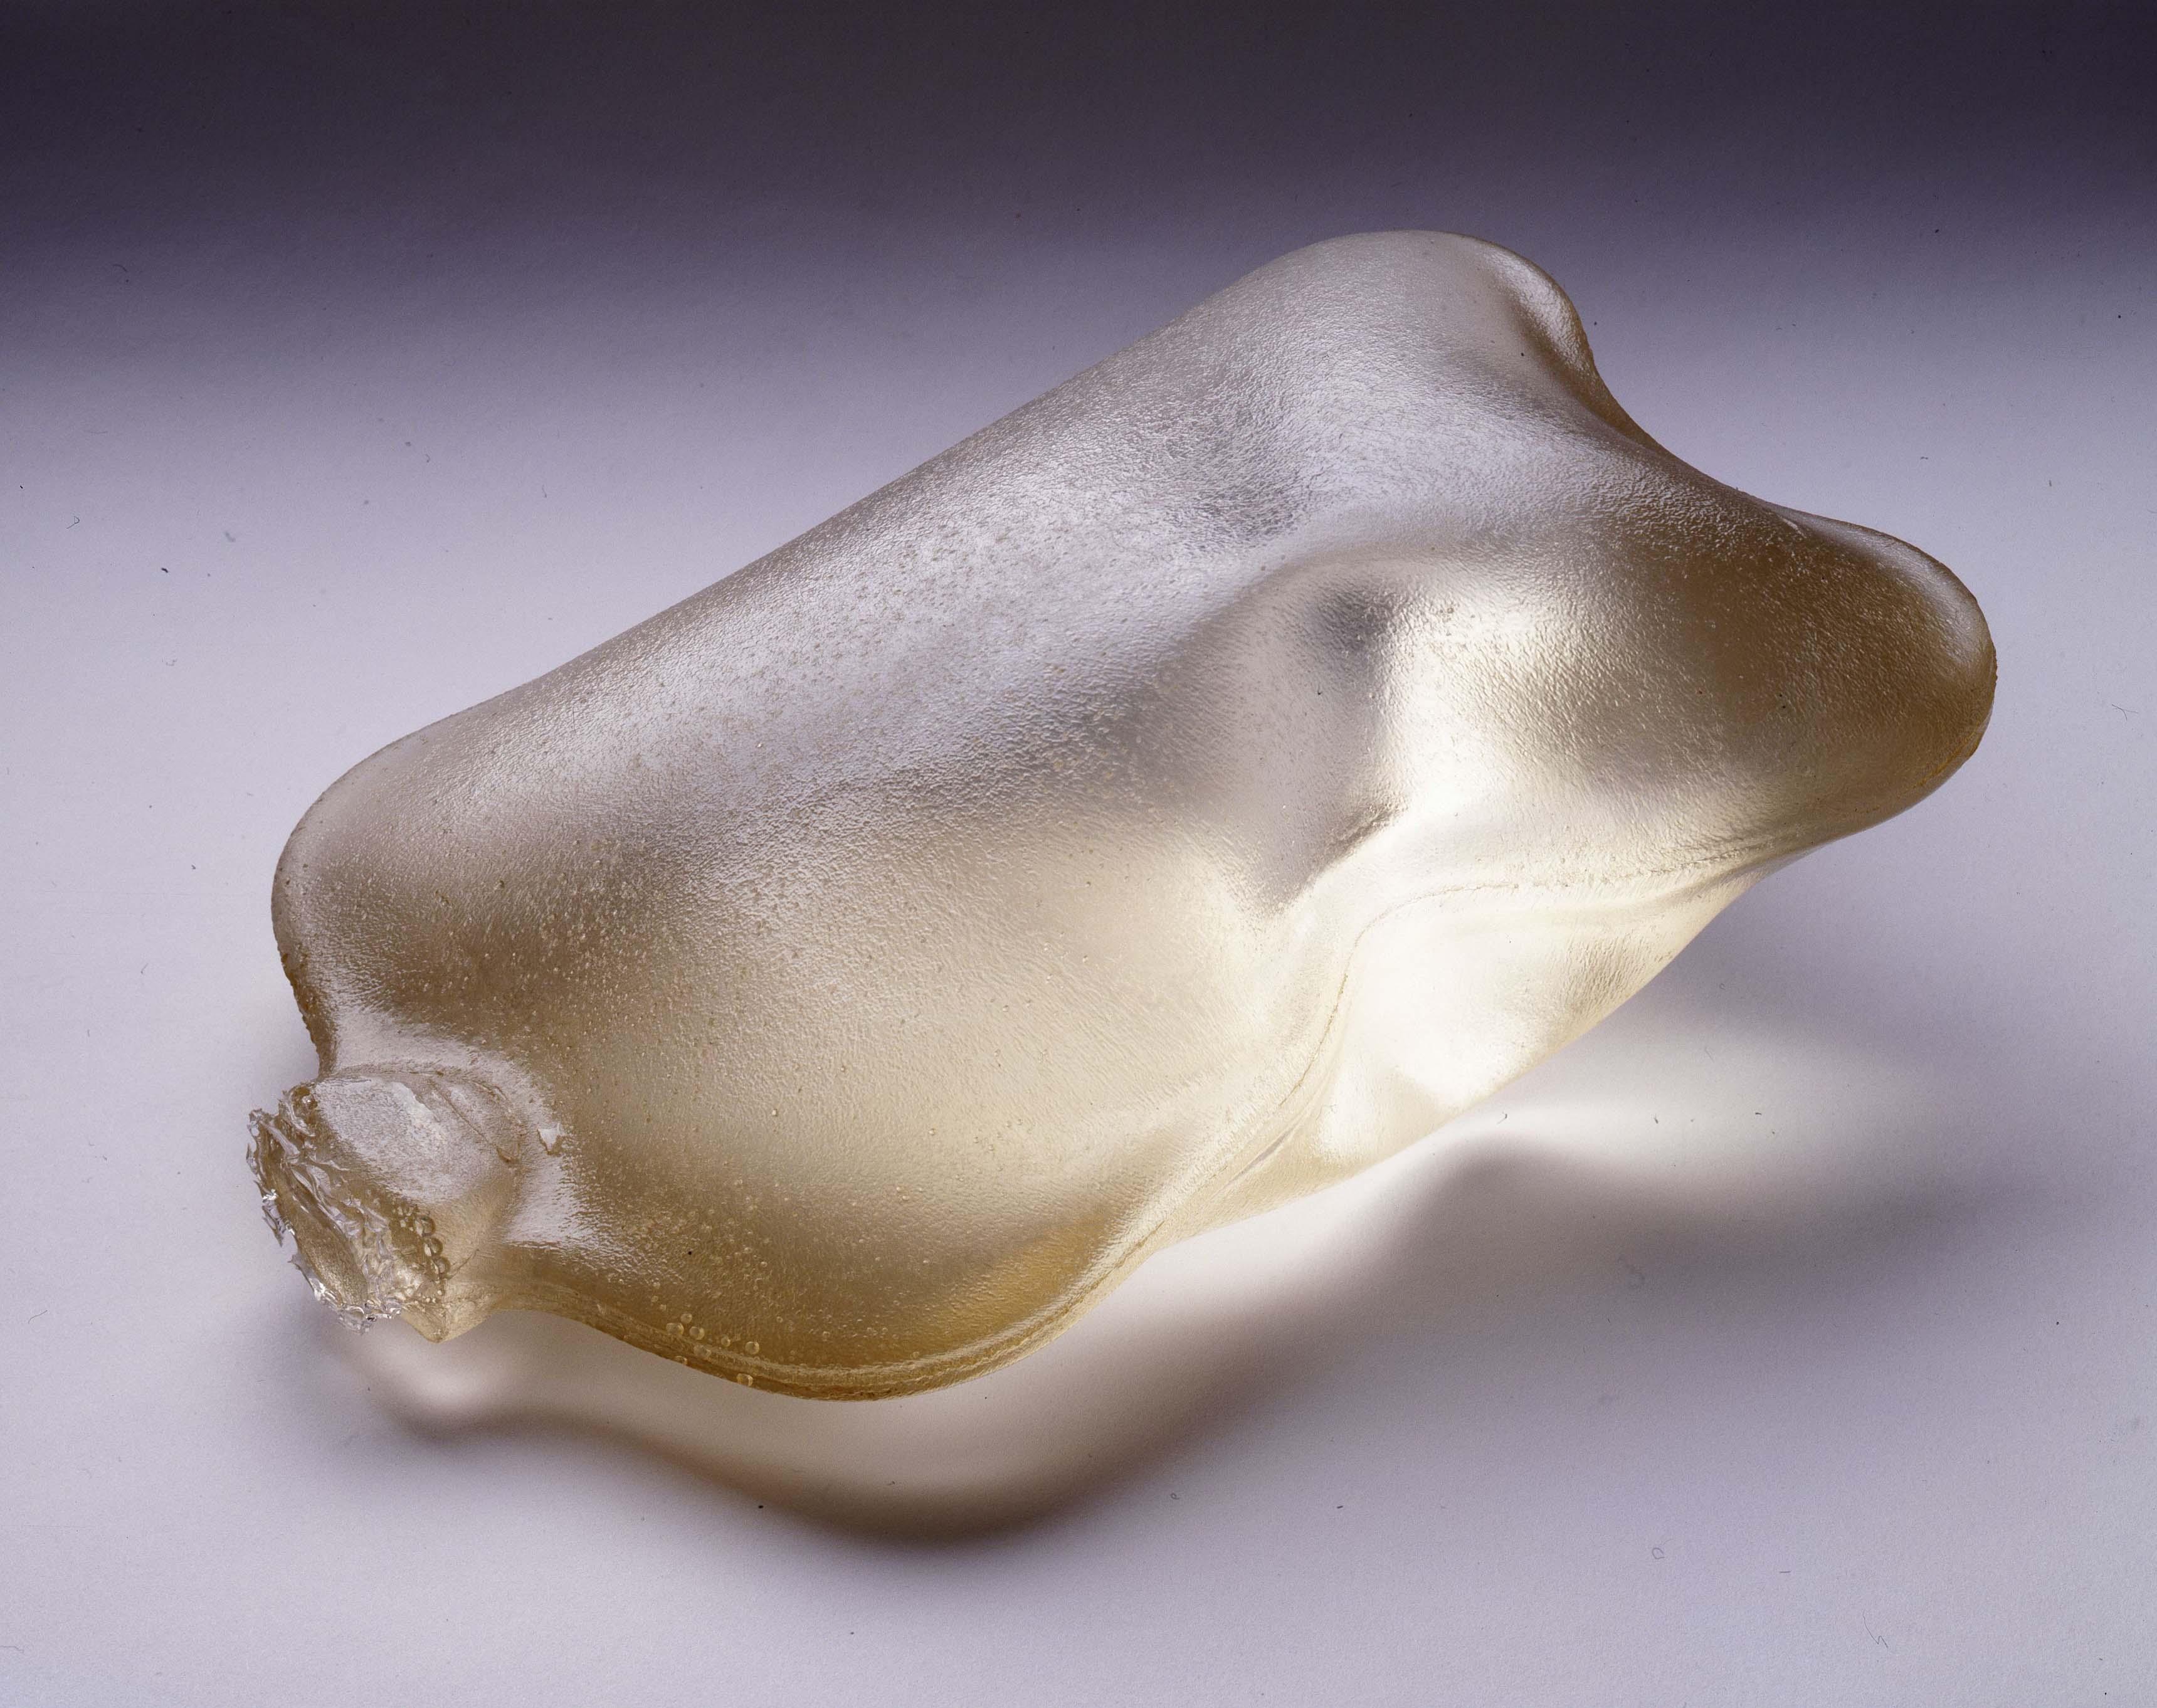 Untitled, 1993, Rachel Whiteread